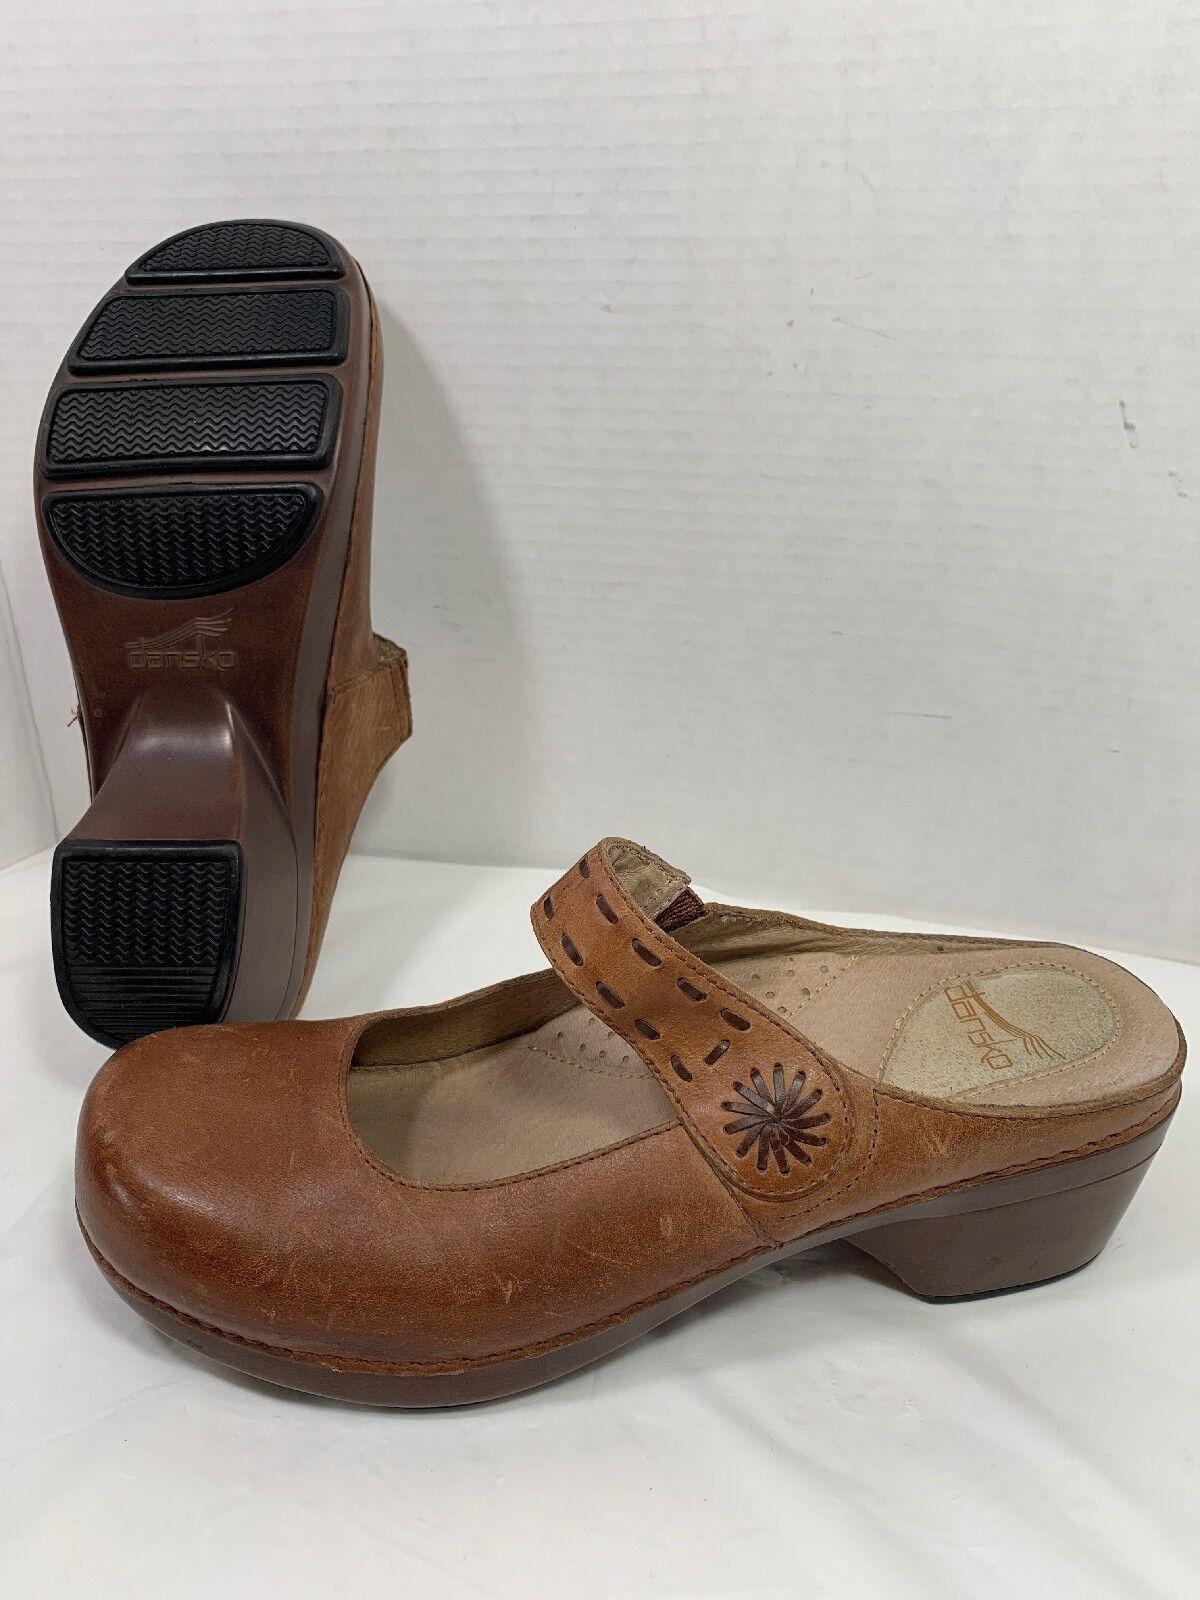 Dansko Leather Mary Jane Professional Professional Professional work Clogs damen braun Größe 40 US 9.5-10 e3b3e4